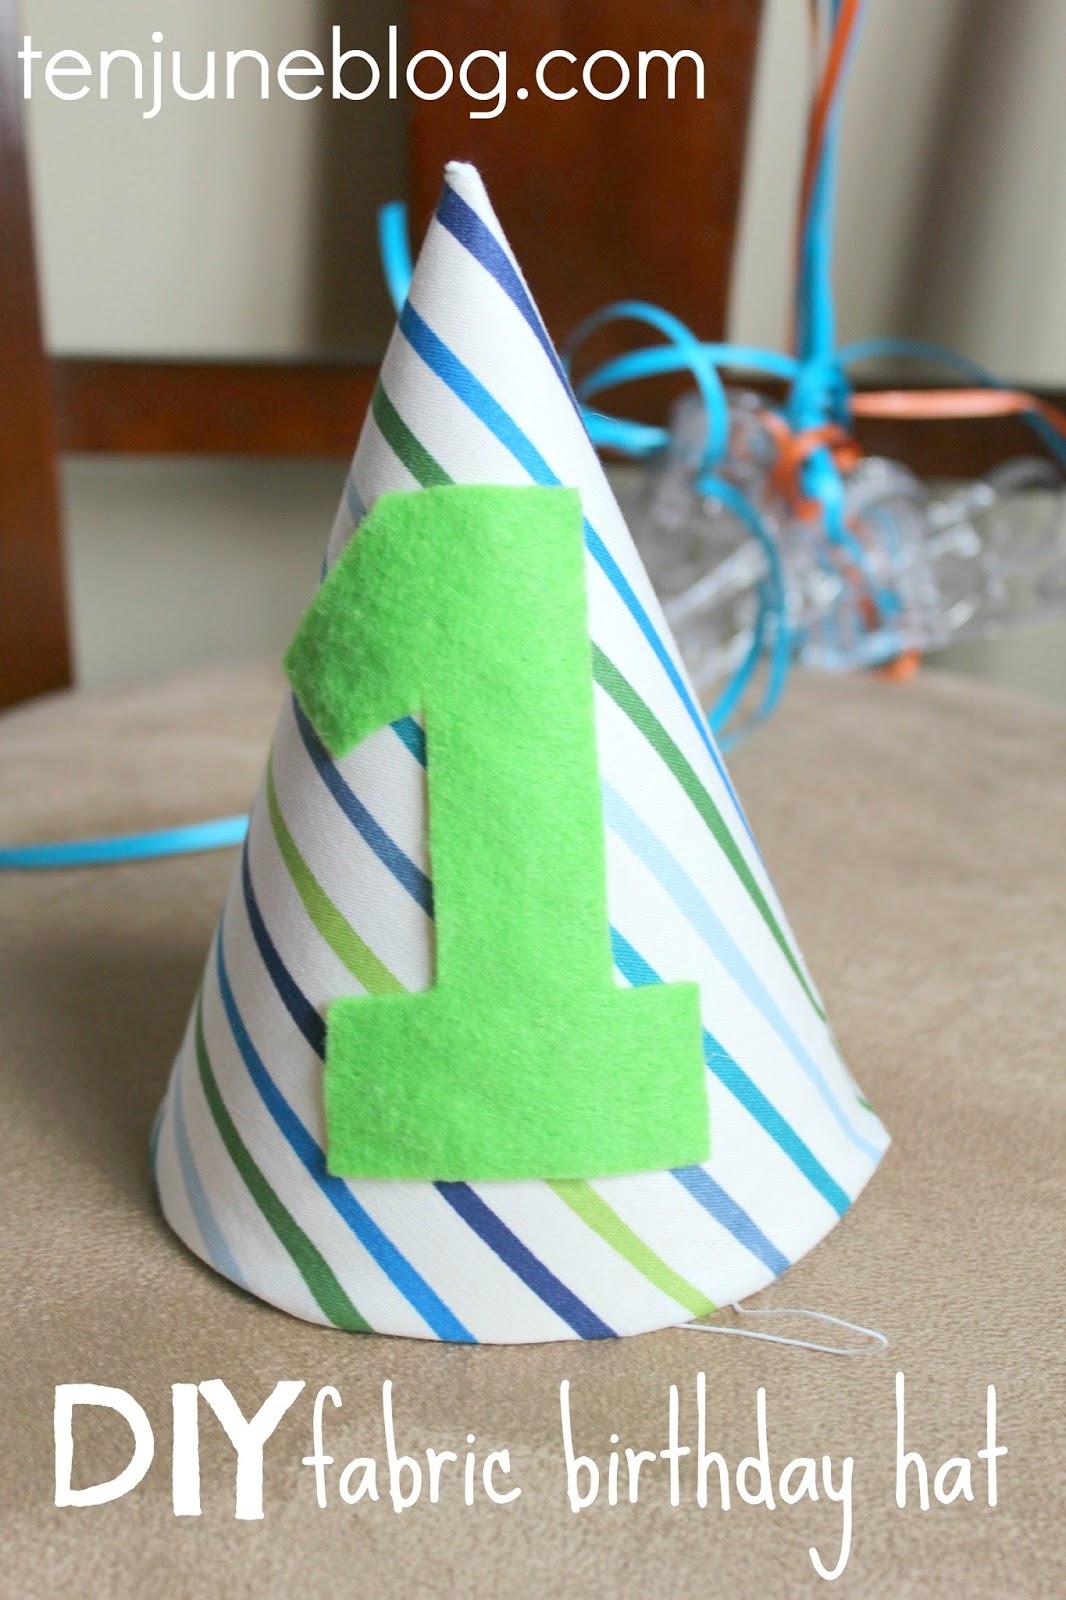 ten june diy fabric 3 birthday hat tutorial